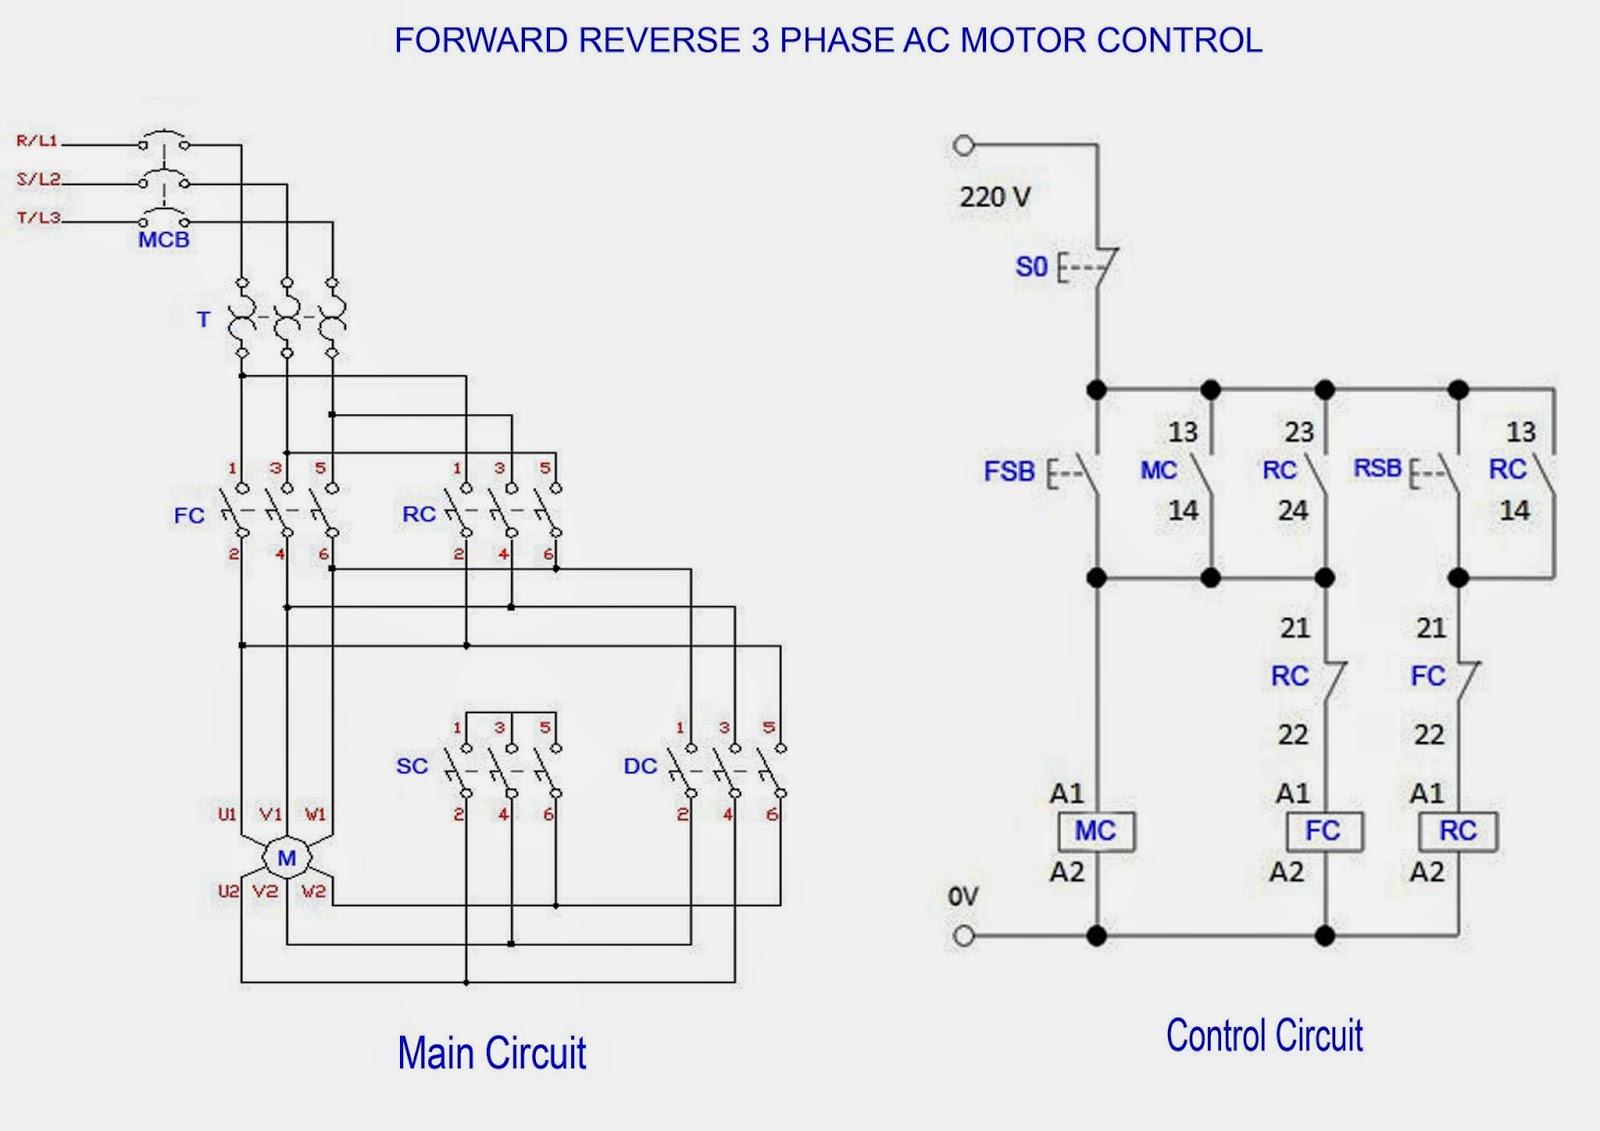 220 110 3Ph Panel Wiring Diagram | Manual E-Books - 220 To 110 Wiring Diagram